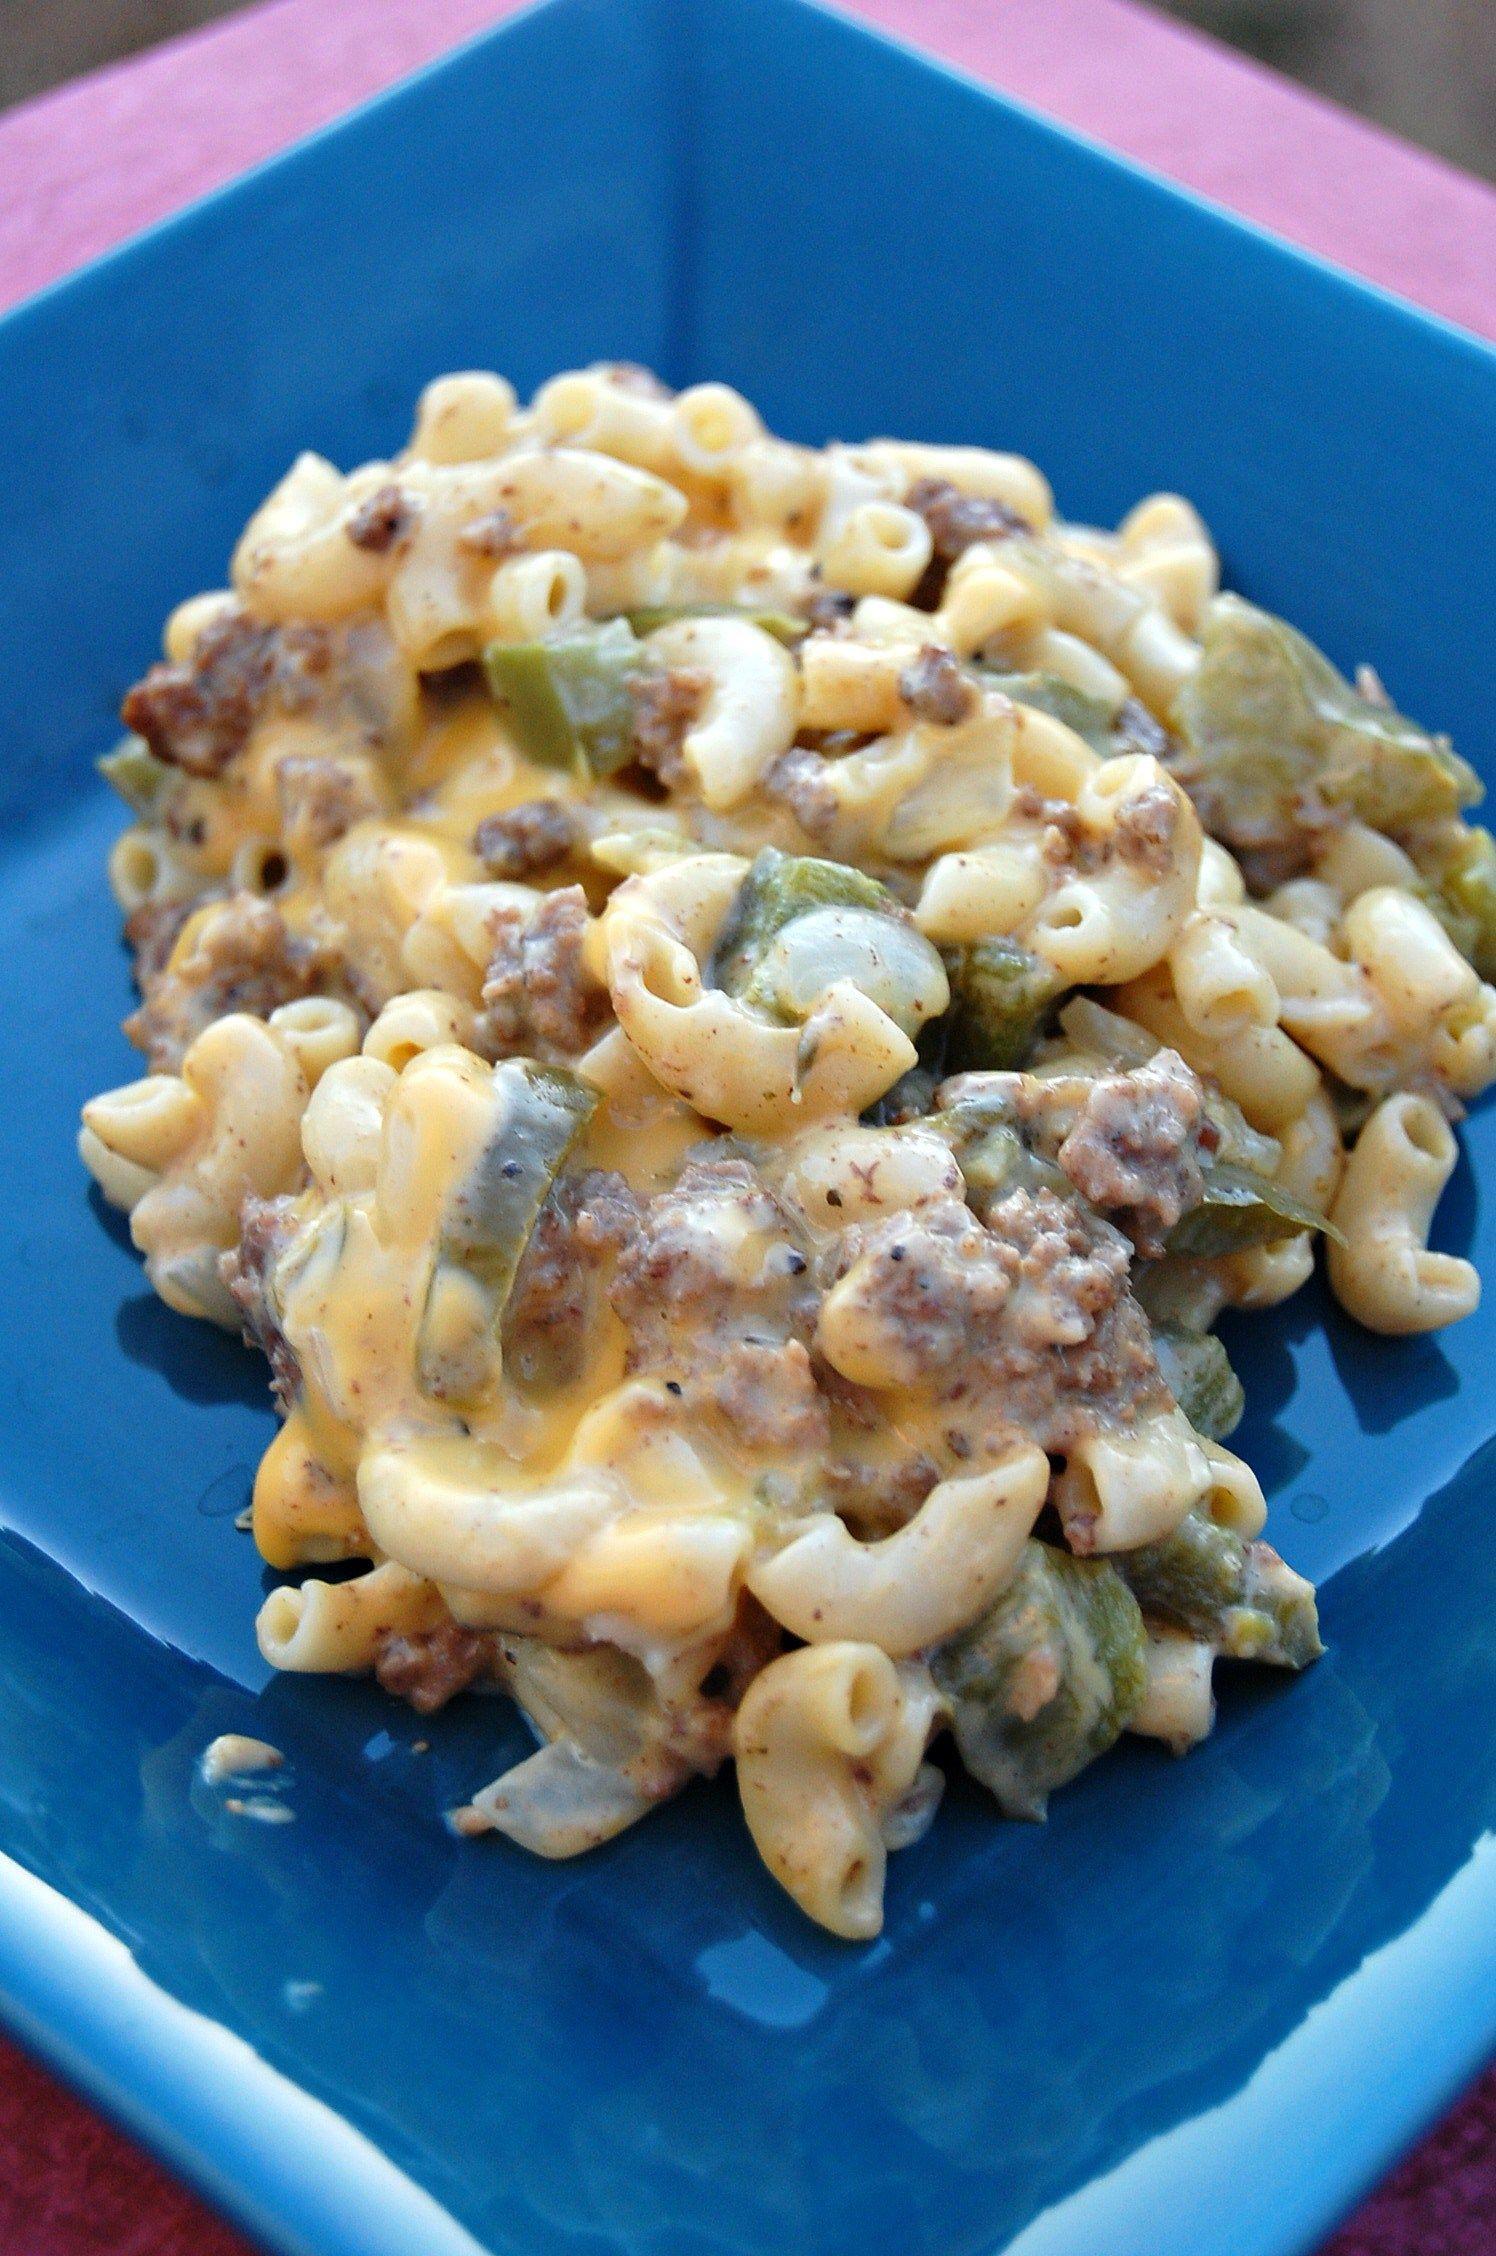 Velveeta Mac And Cheese Recipes With Ground Beef  Cheesesteak Casserole wonderful easy Velveeta